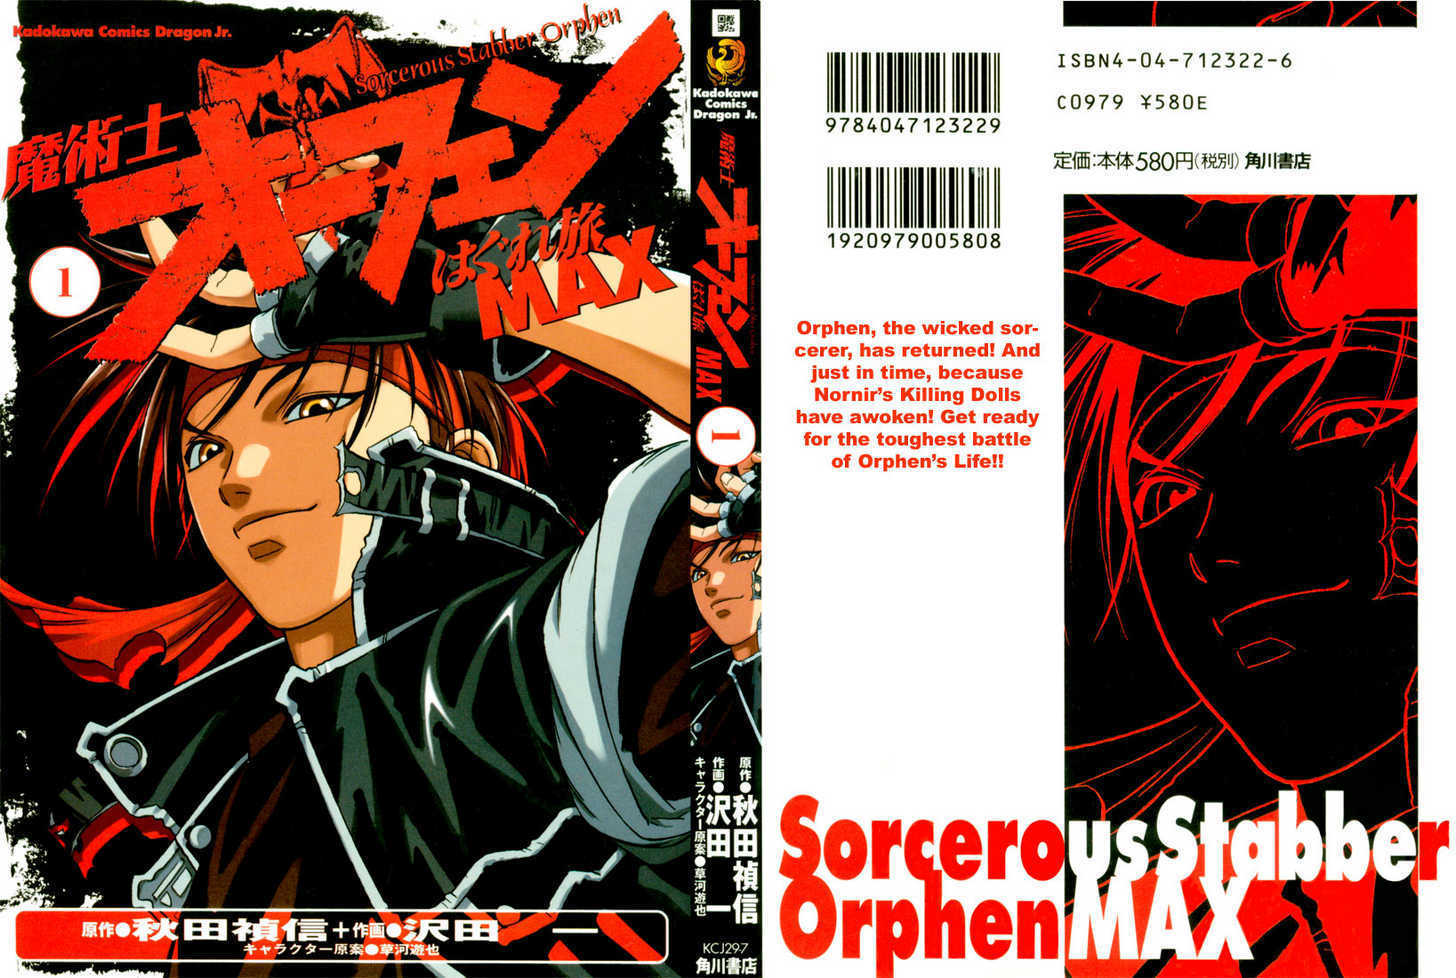 Majutsushi Orphen Hagure Tabi Max 1 Page 1